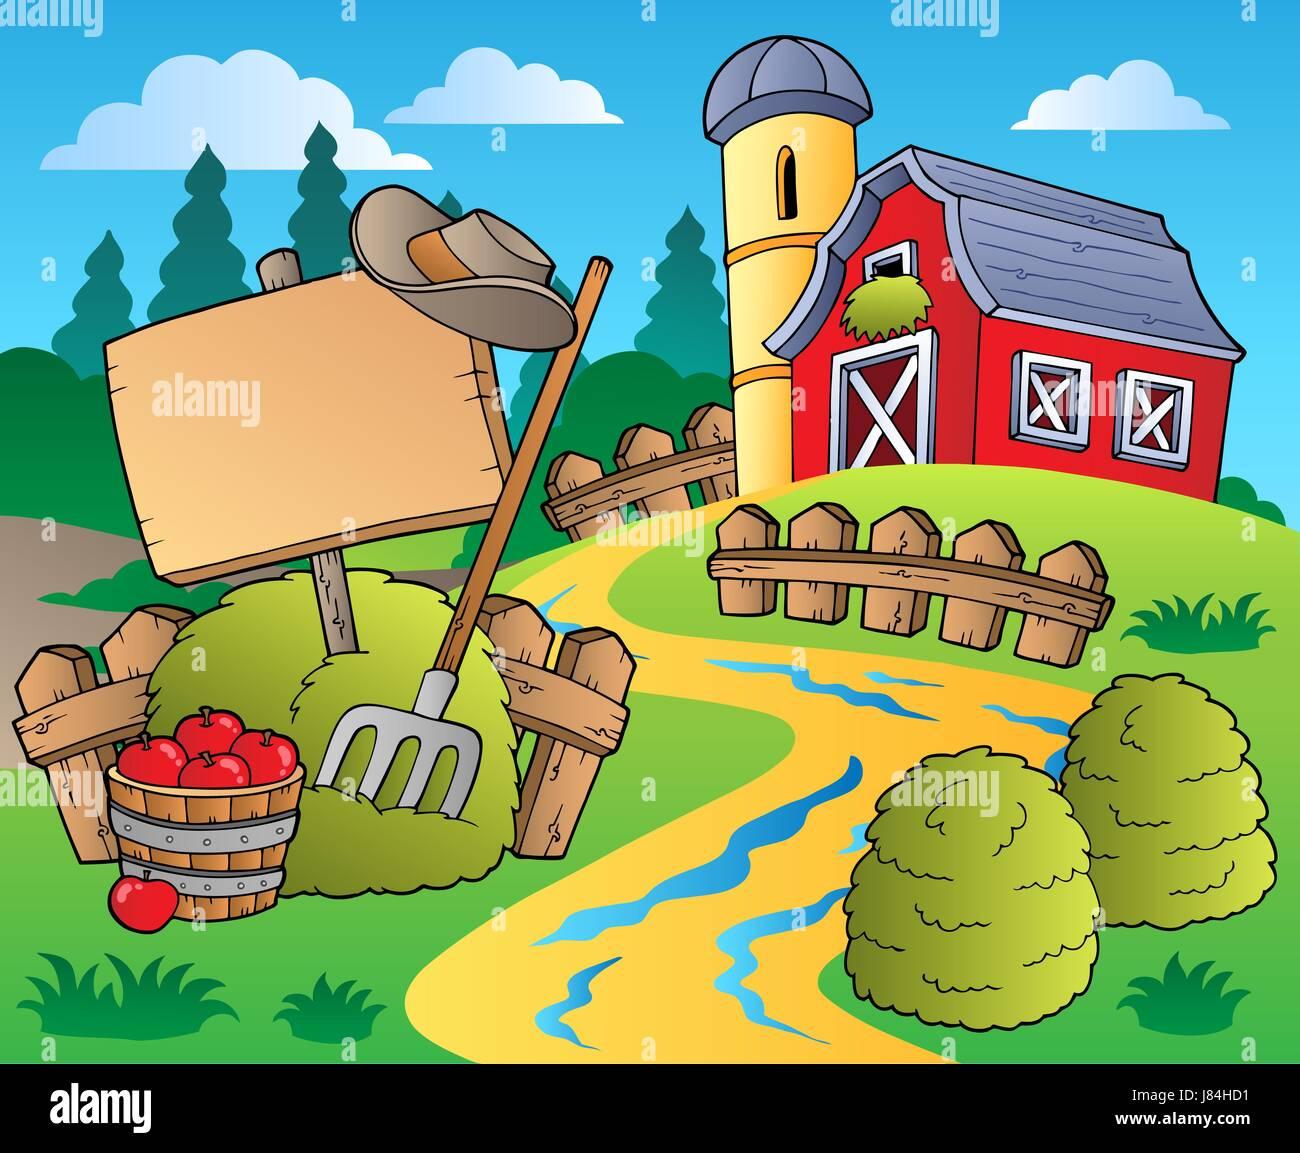 Farmyard Barn Cartoon Stockfotos & Farmyard Barn Cartoon Bilder - Alamy